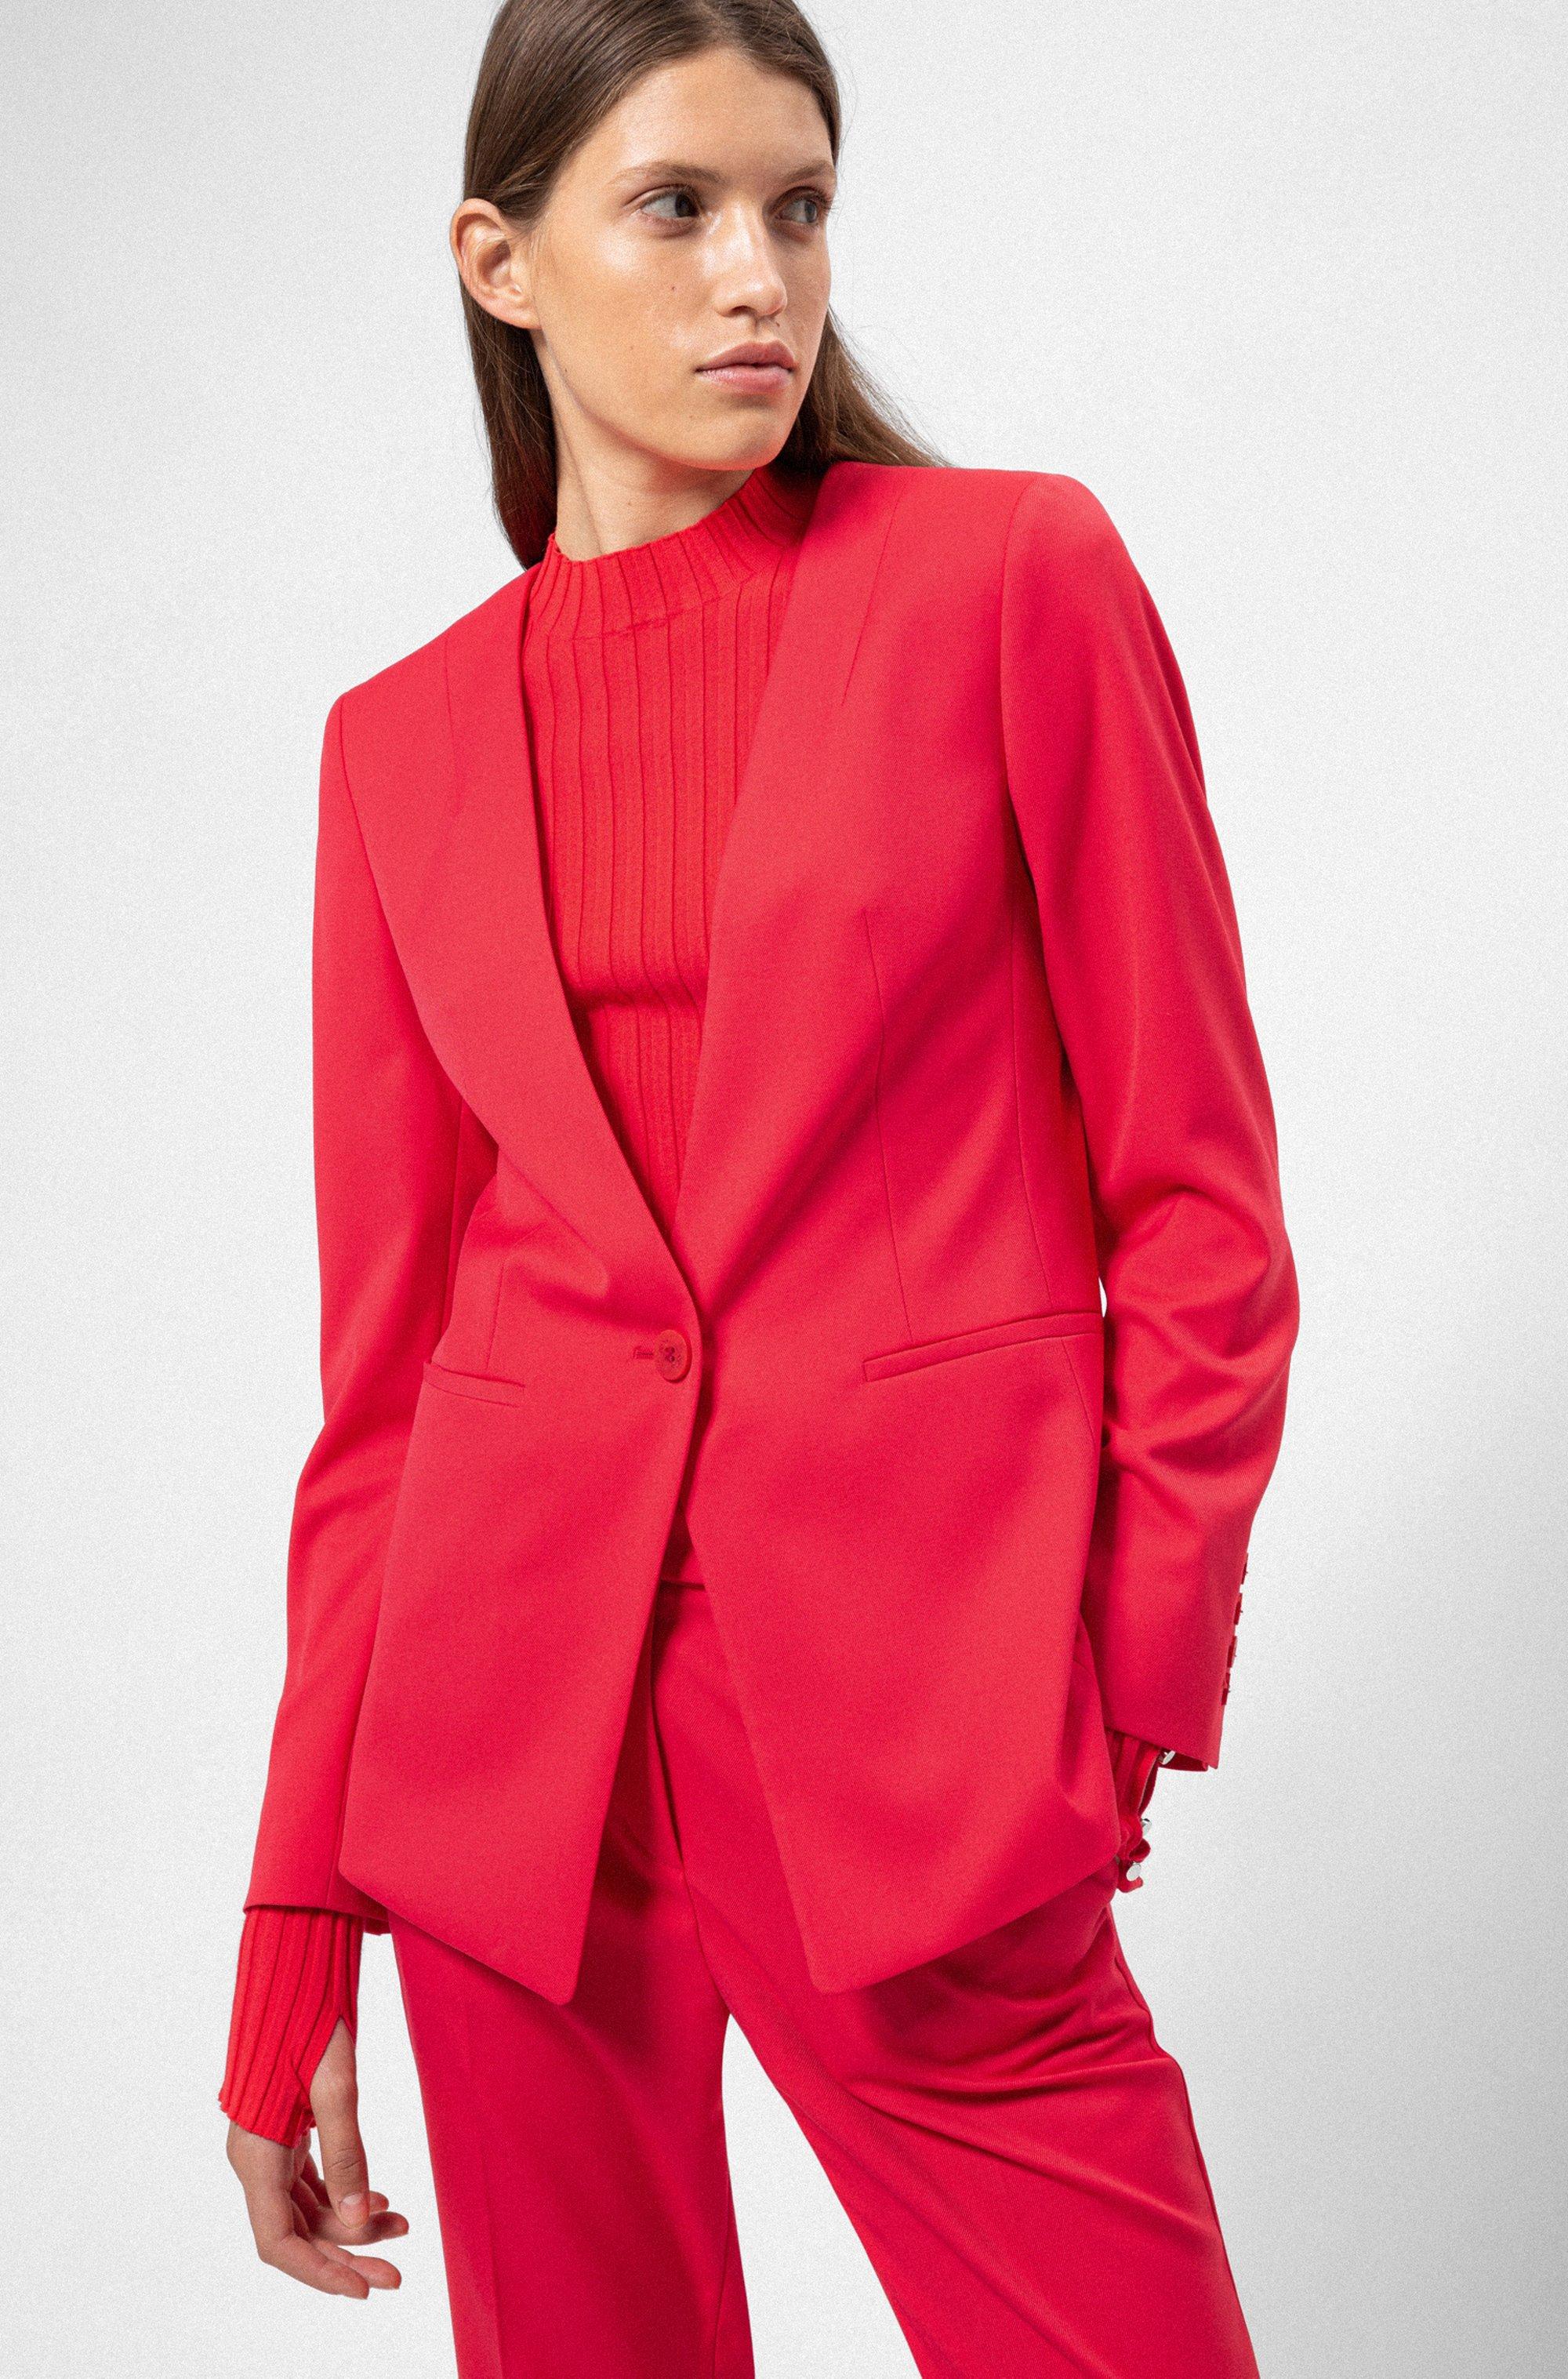 Regular-fit jacket in a long length